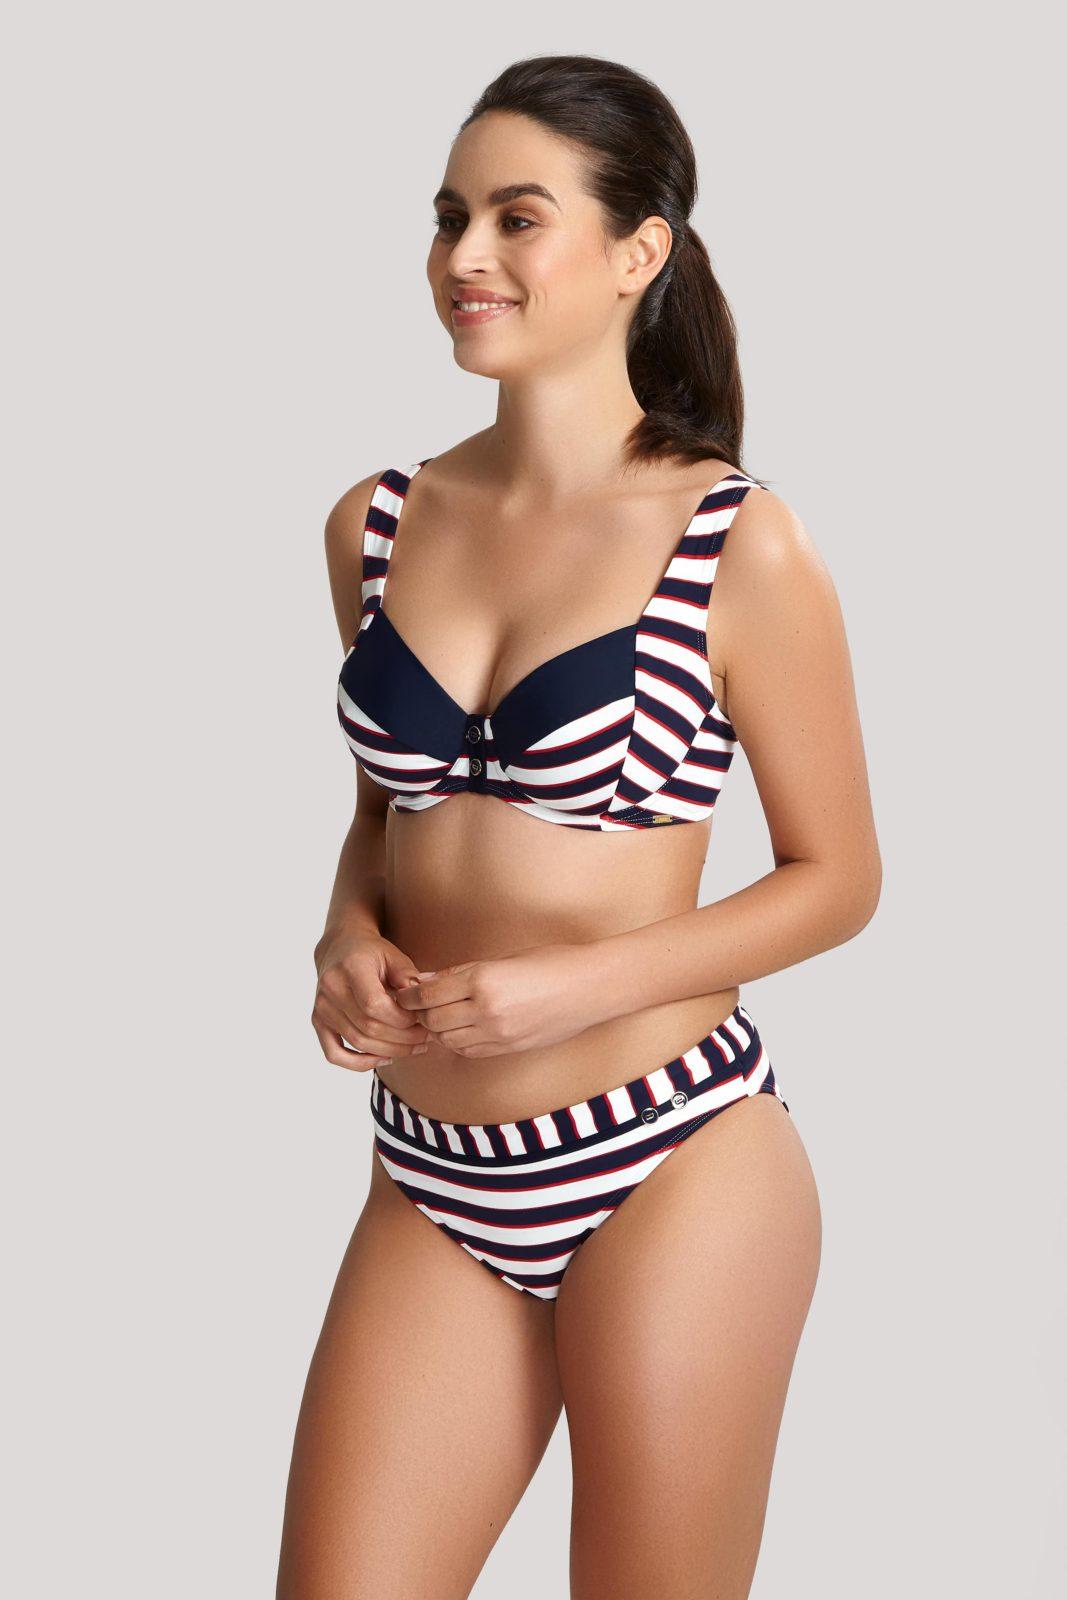 Купальники SW1372_622_5 Lucille Balconnet Bikini Top Navy Stripe T F 5-min